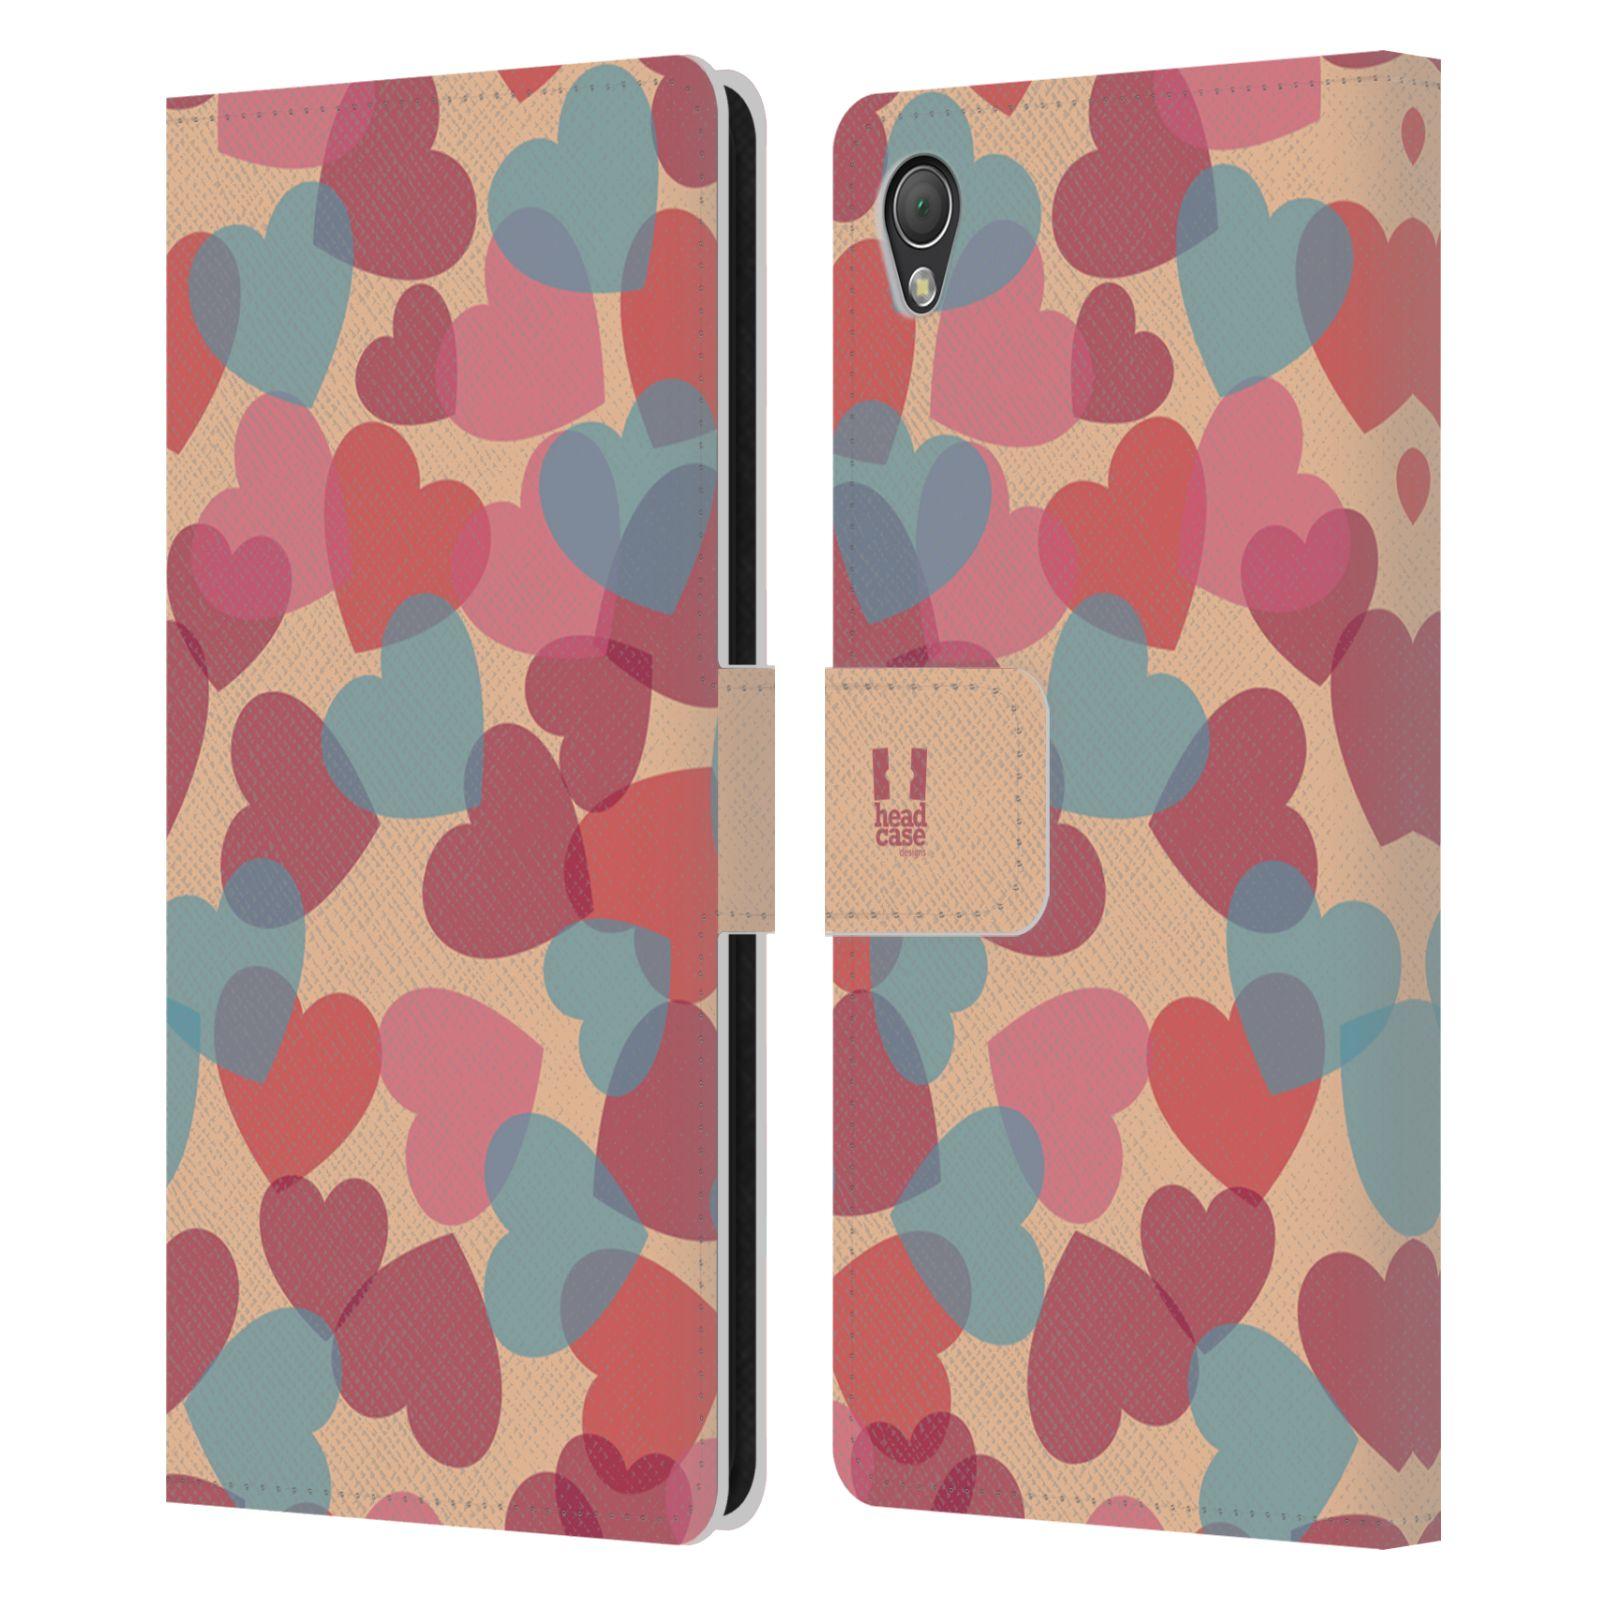 HEAD CASE Flipové pouzdro pro mobil SONY XPERIA Z3 vzor prolínající se srdíčka, srdce, láska, růžová